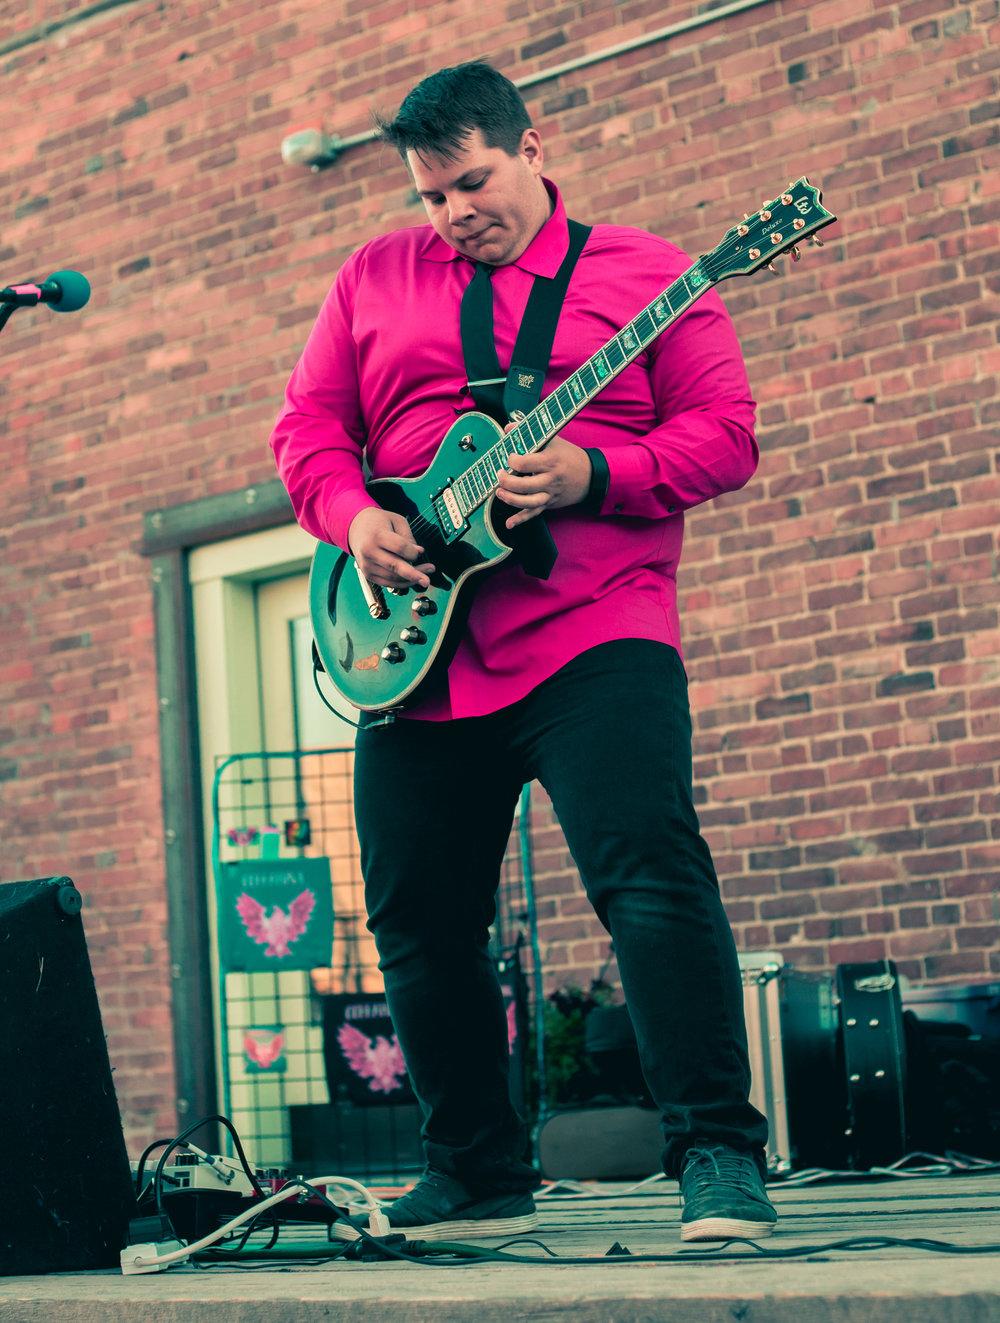 guitar-6555.jpg